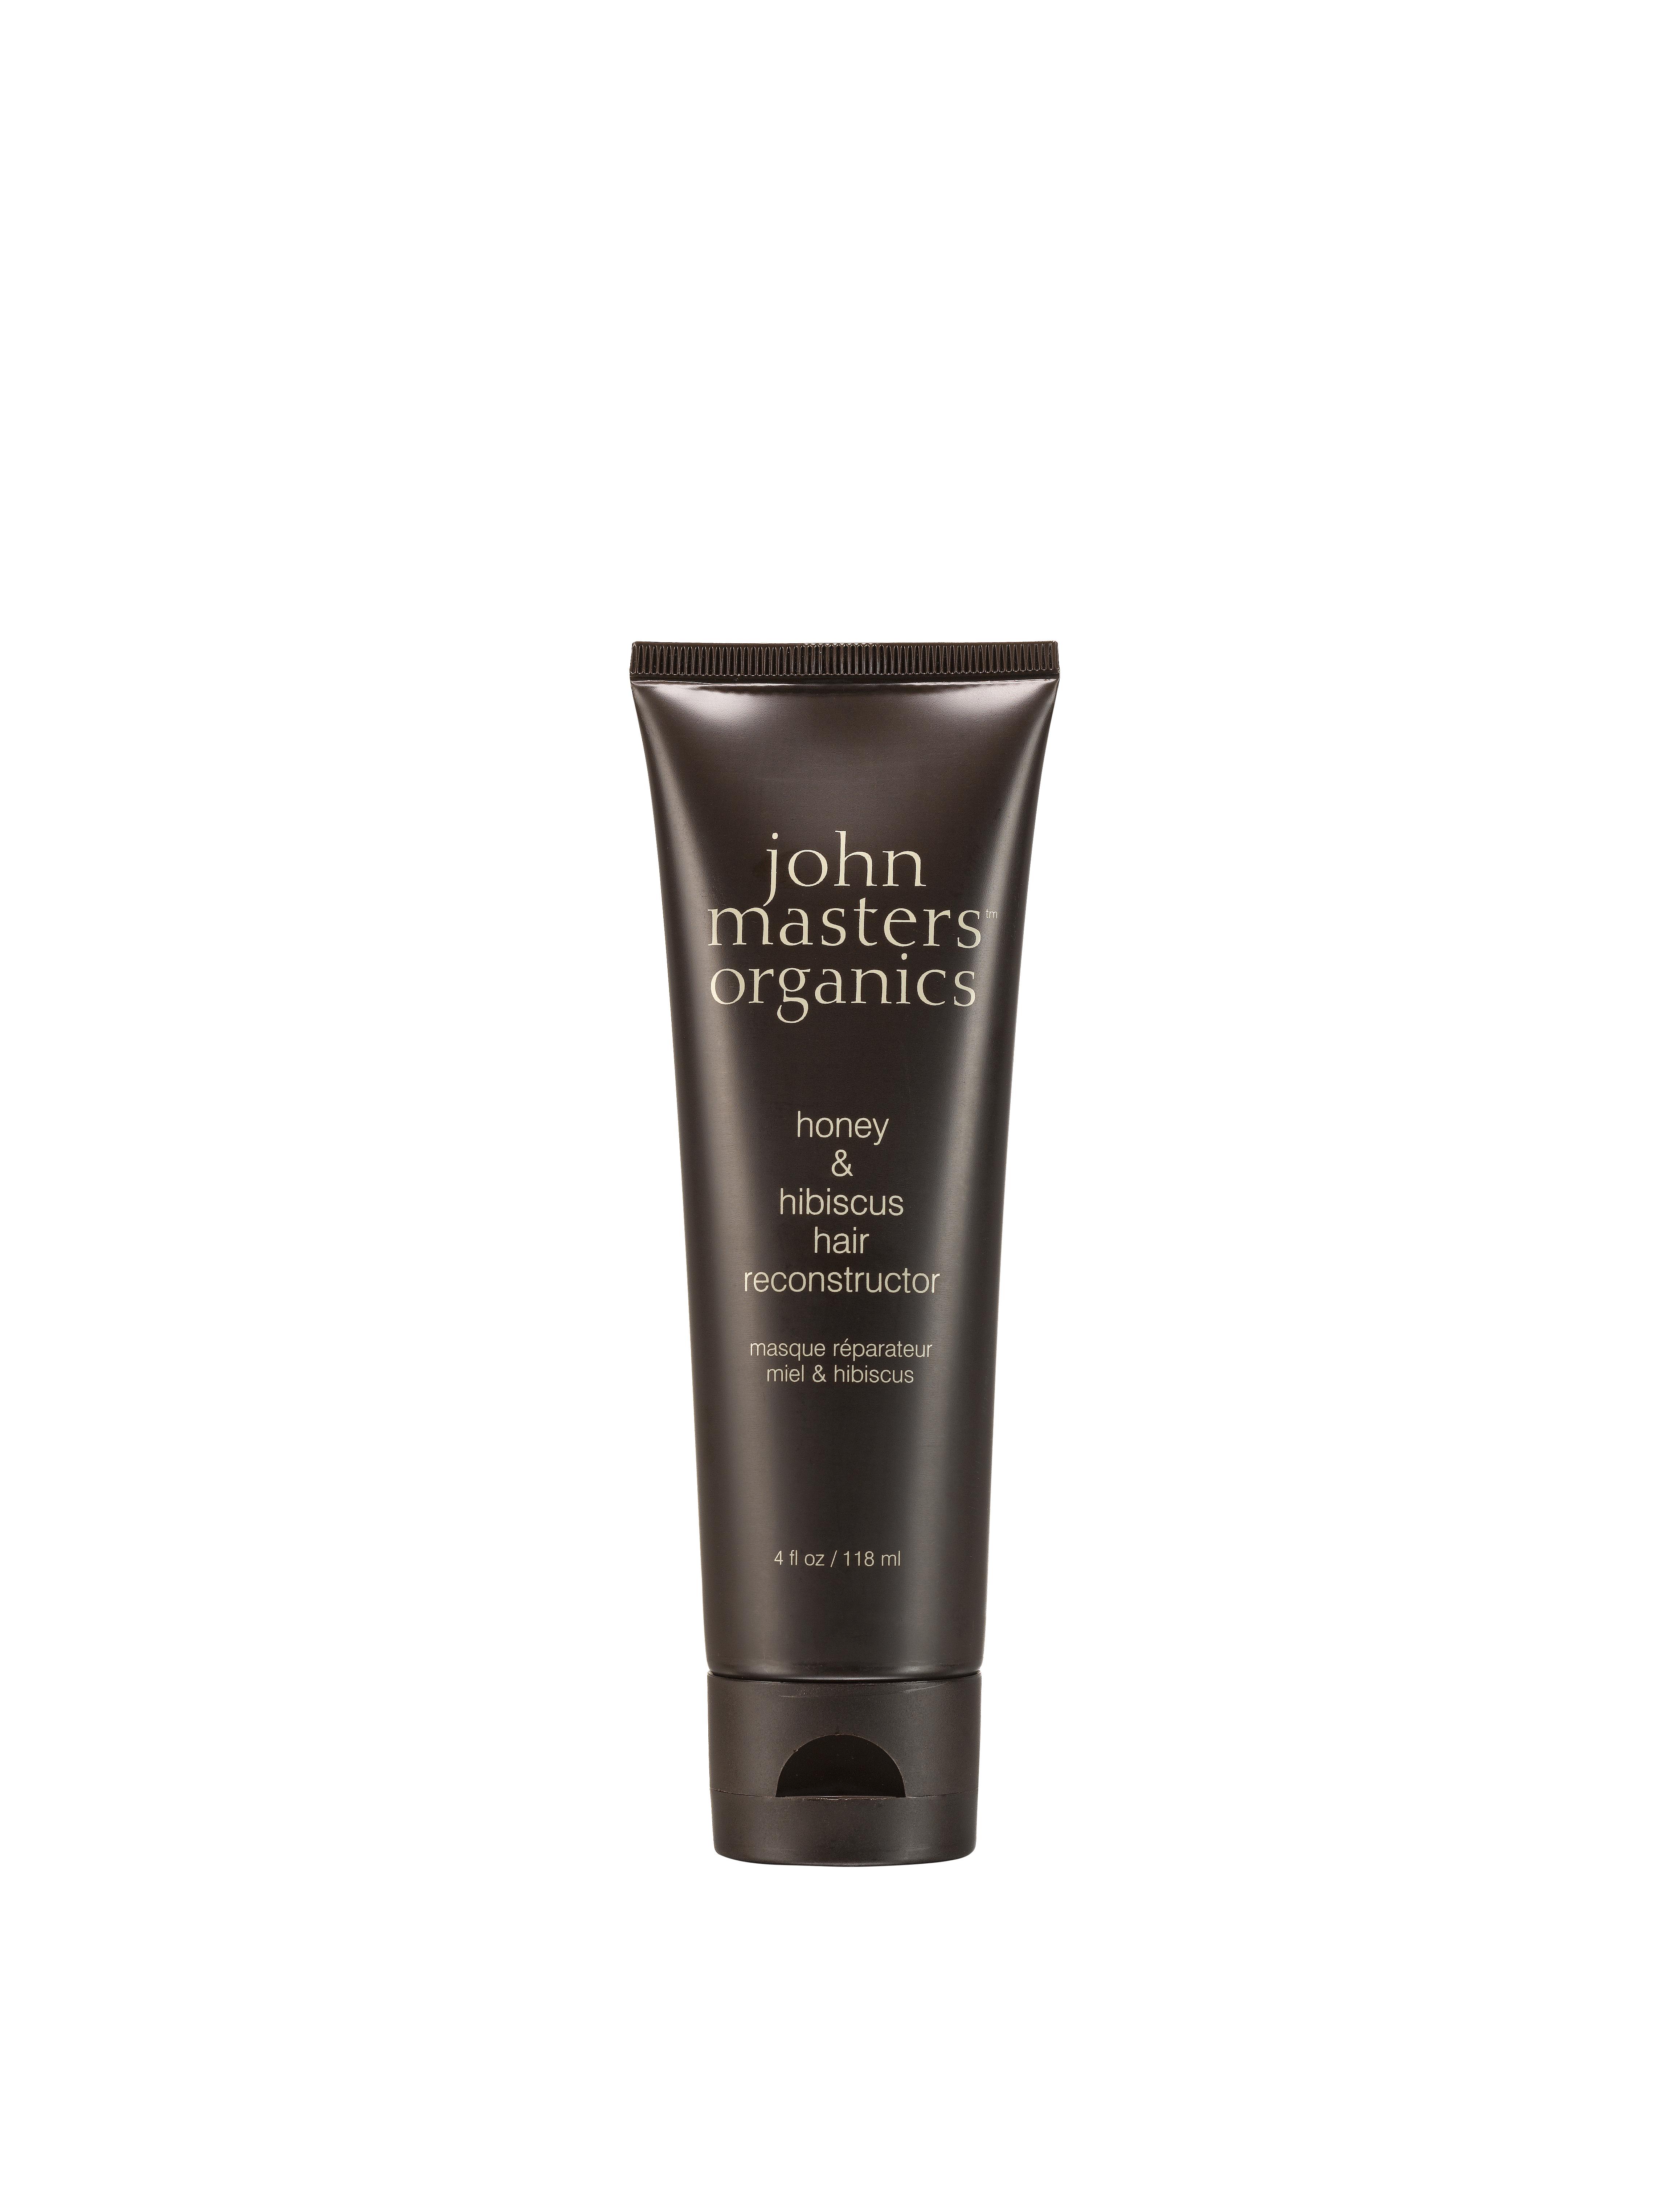 John Masters Organics Honey & Hibiscus Hair Reconstructor, 118 ml